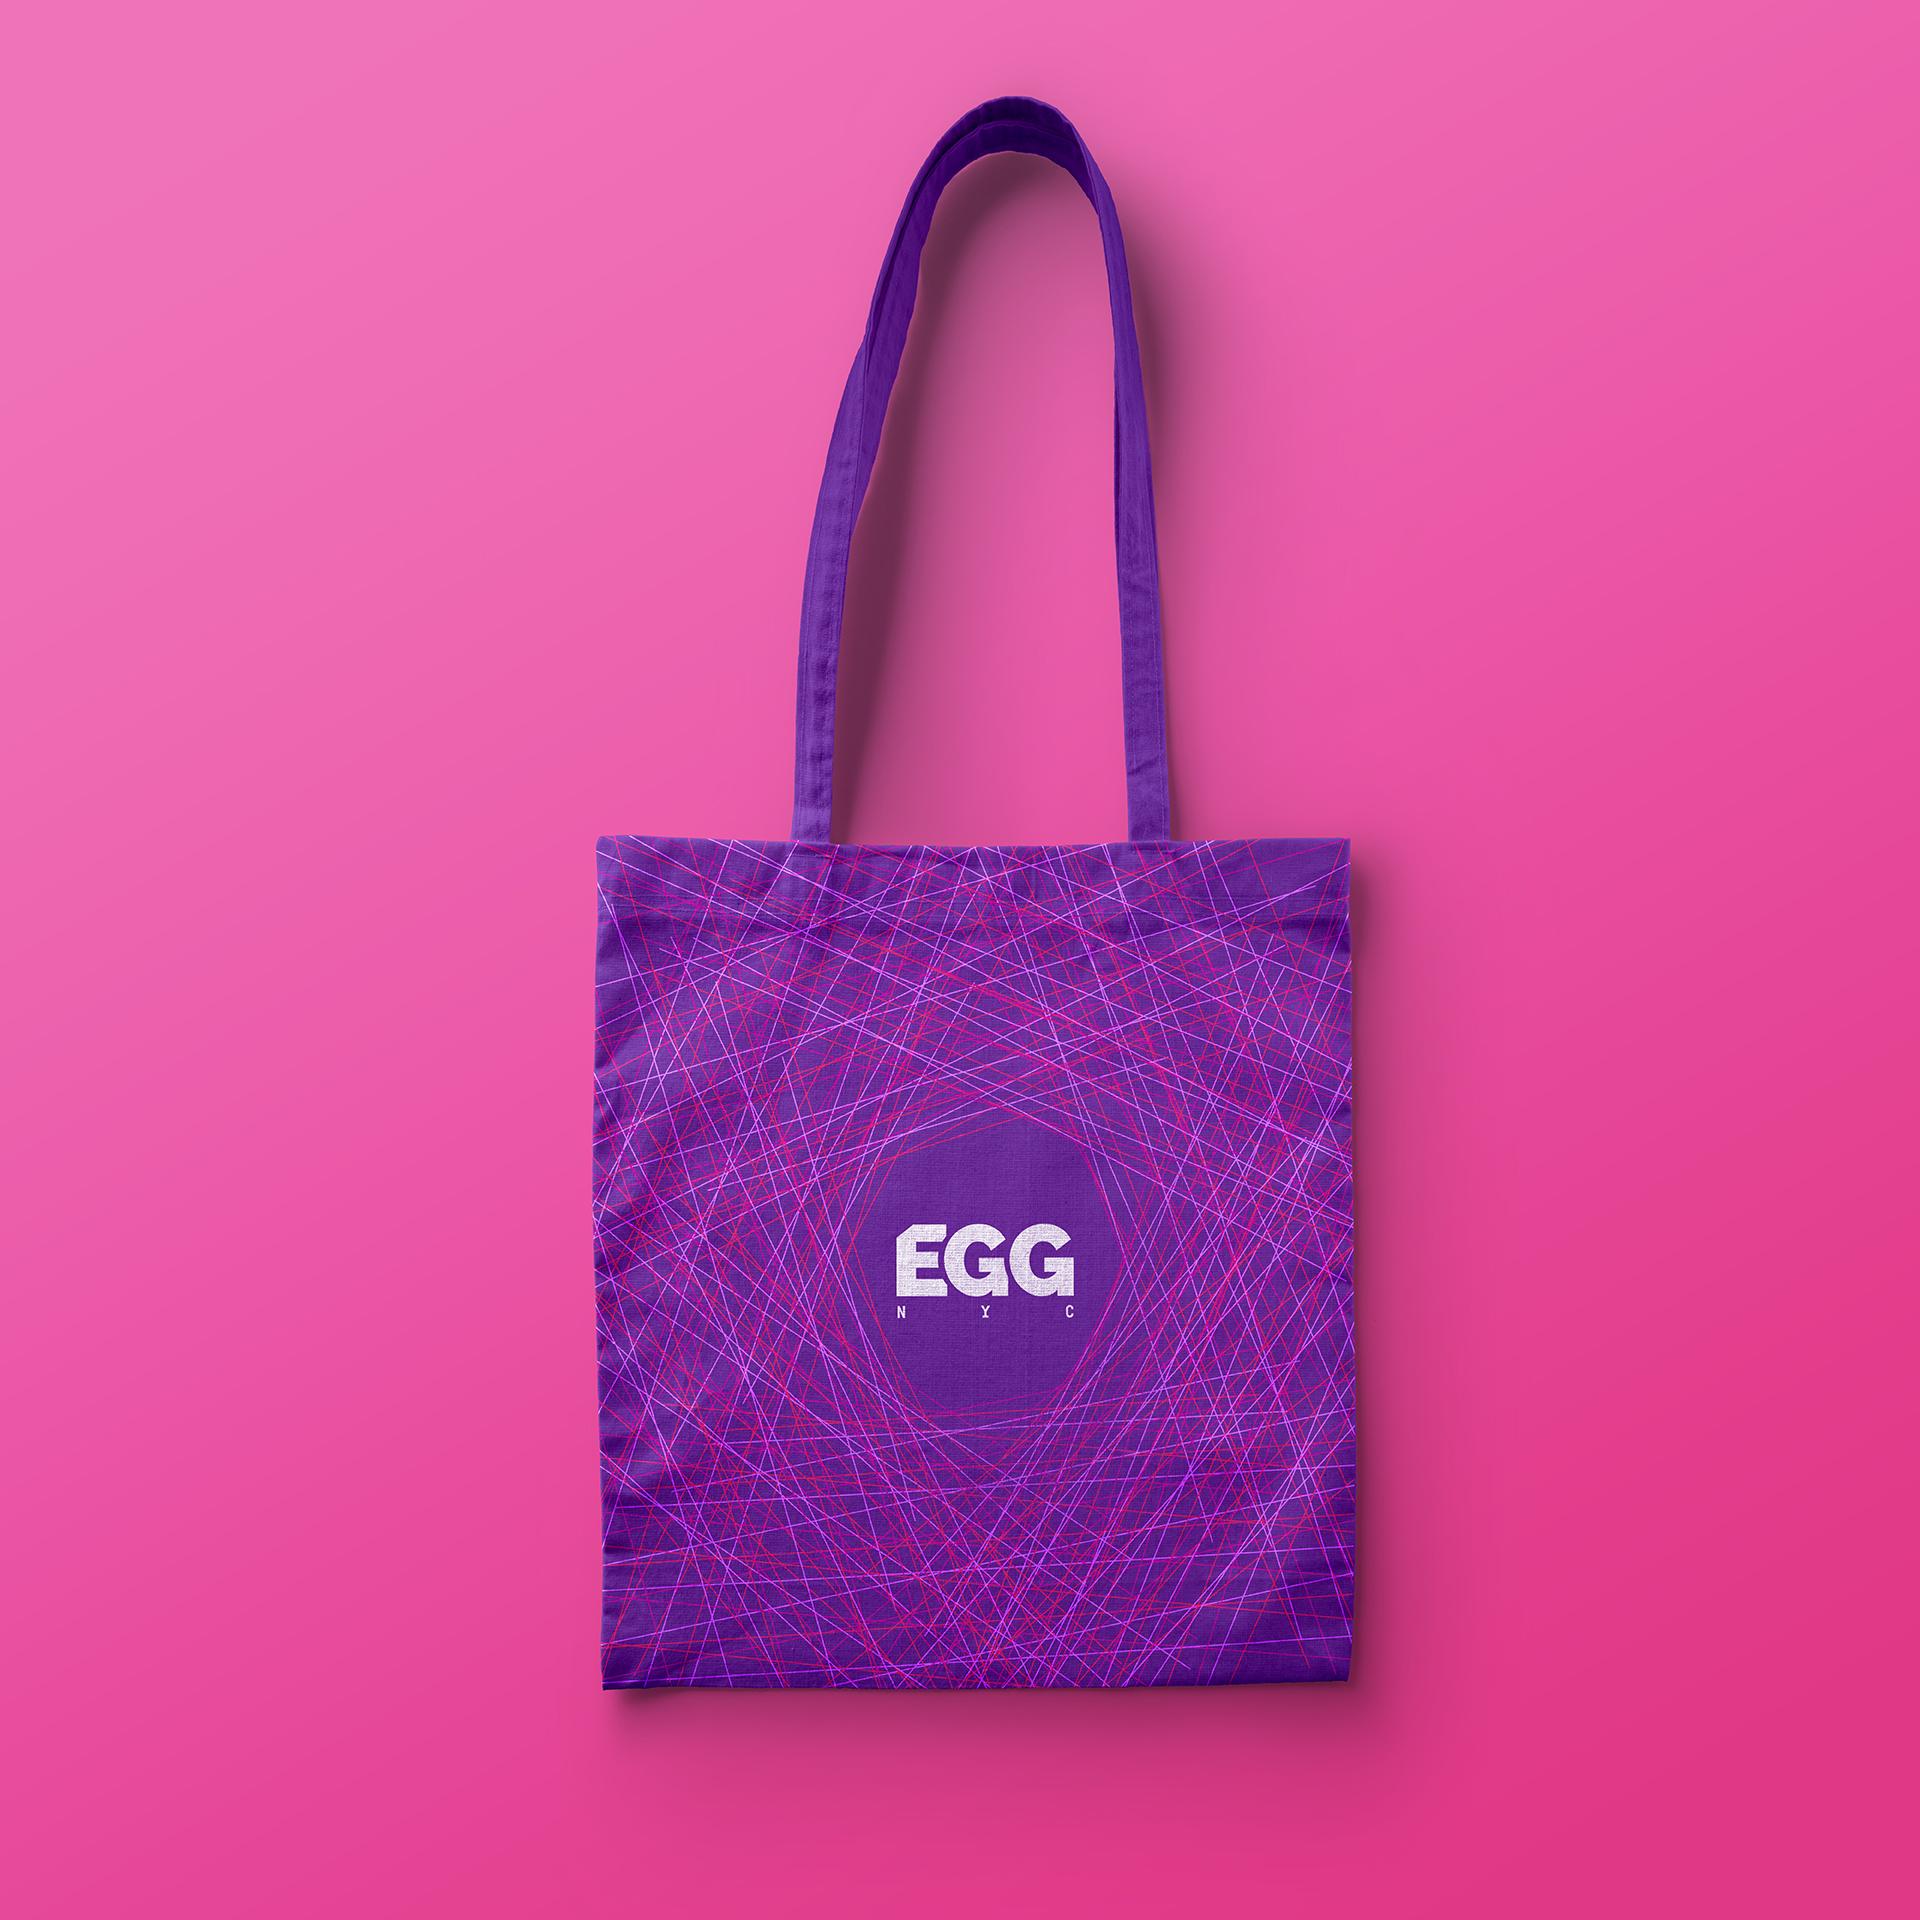 egg_tote.jpg